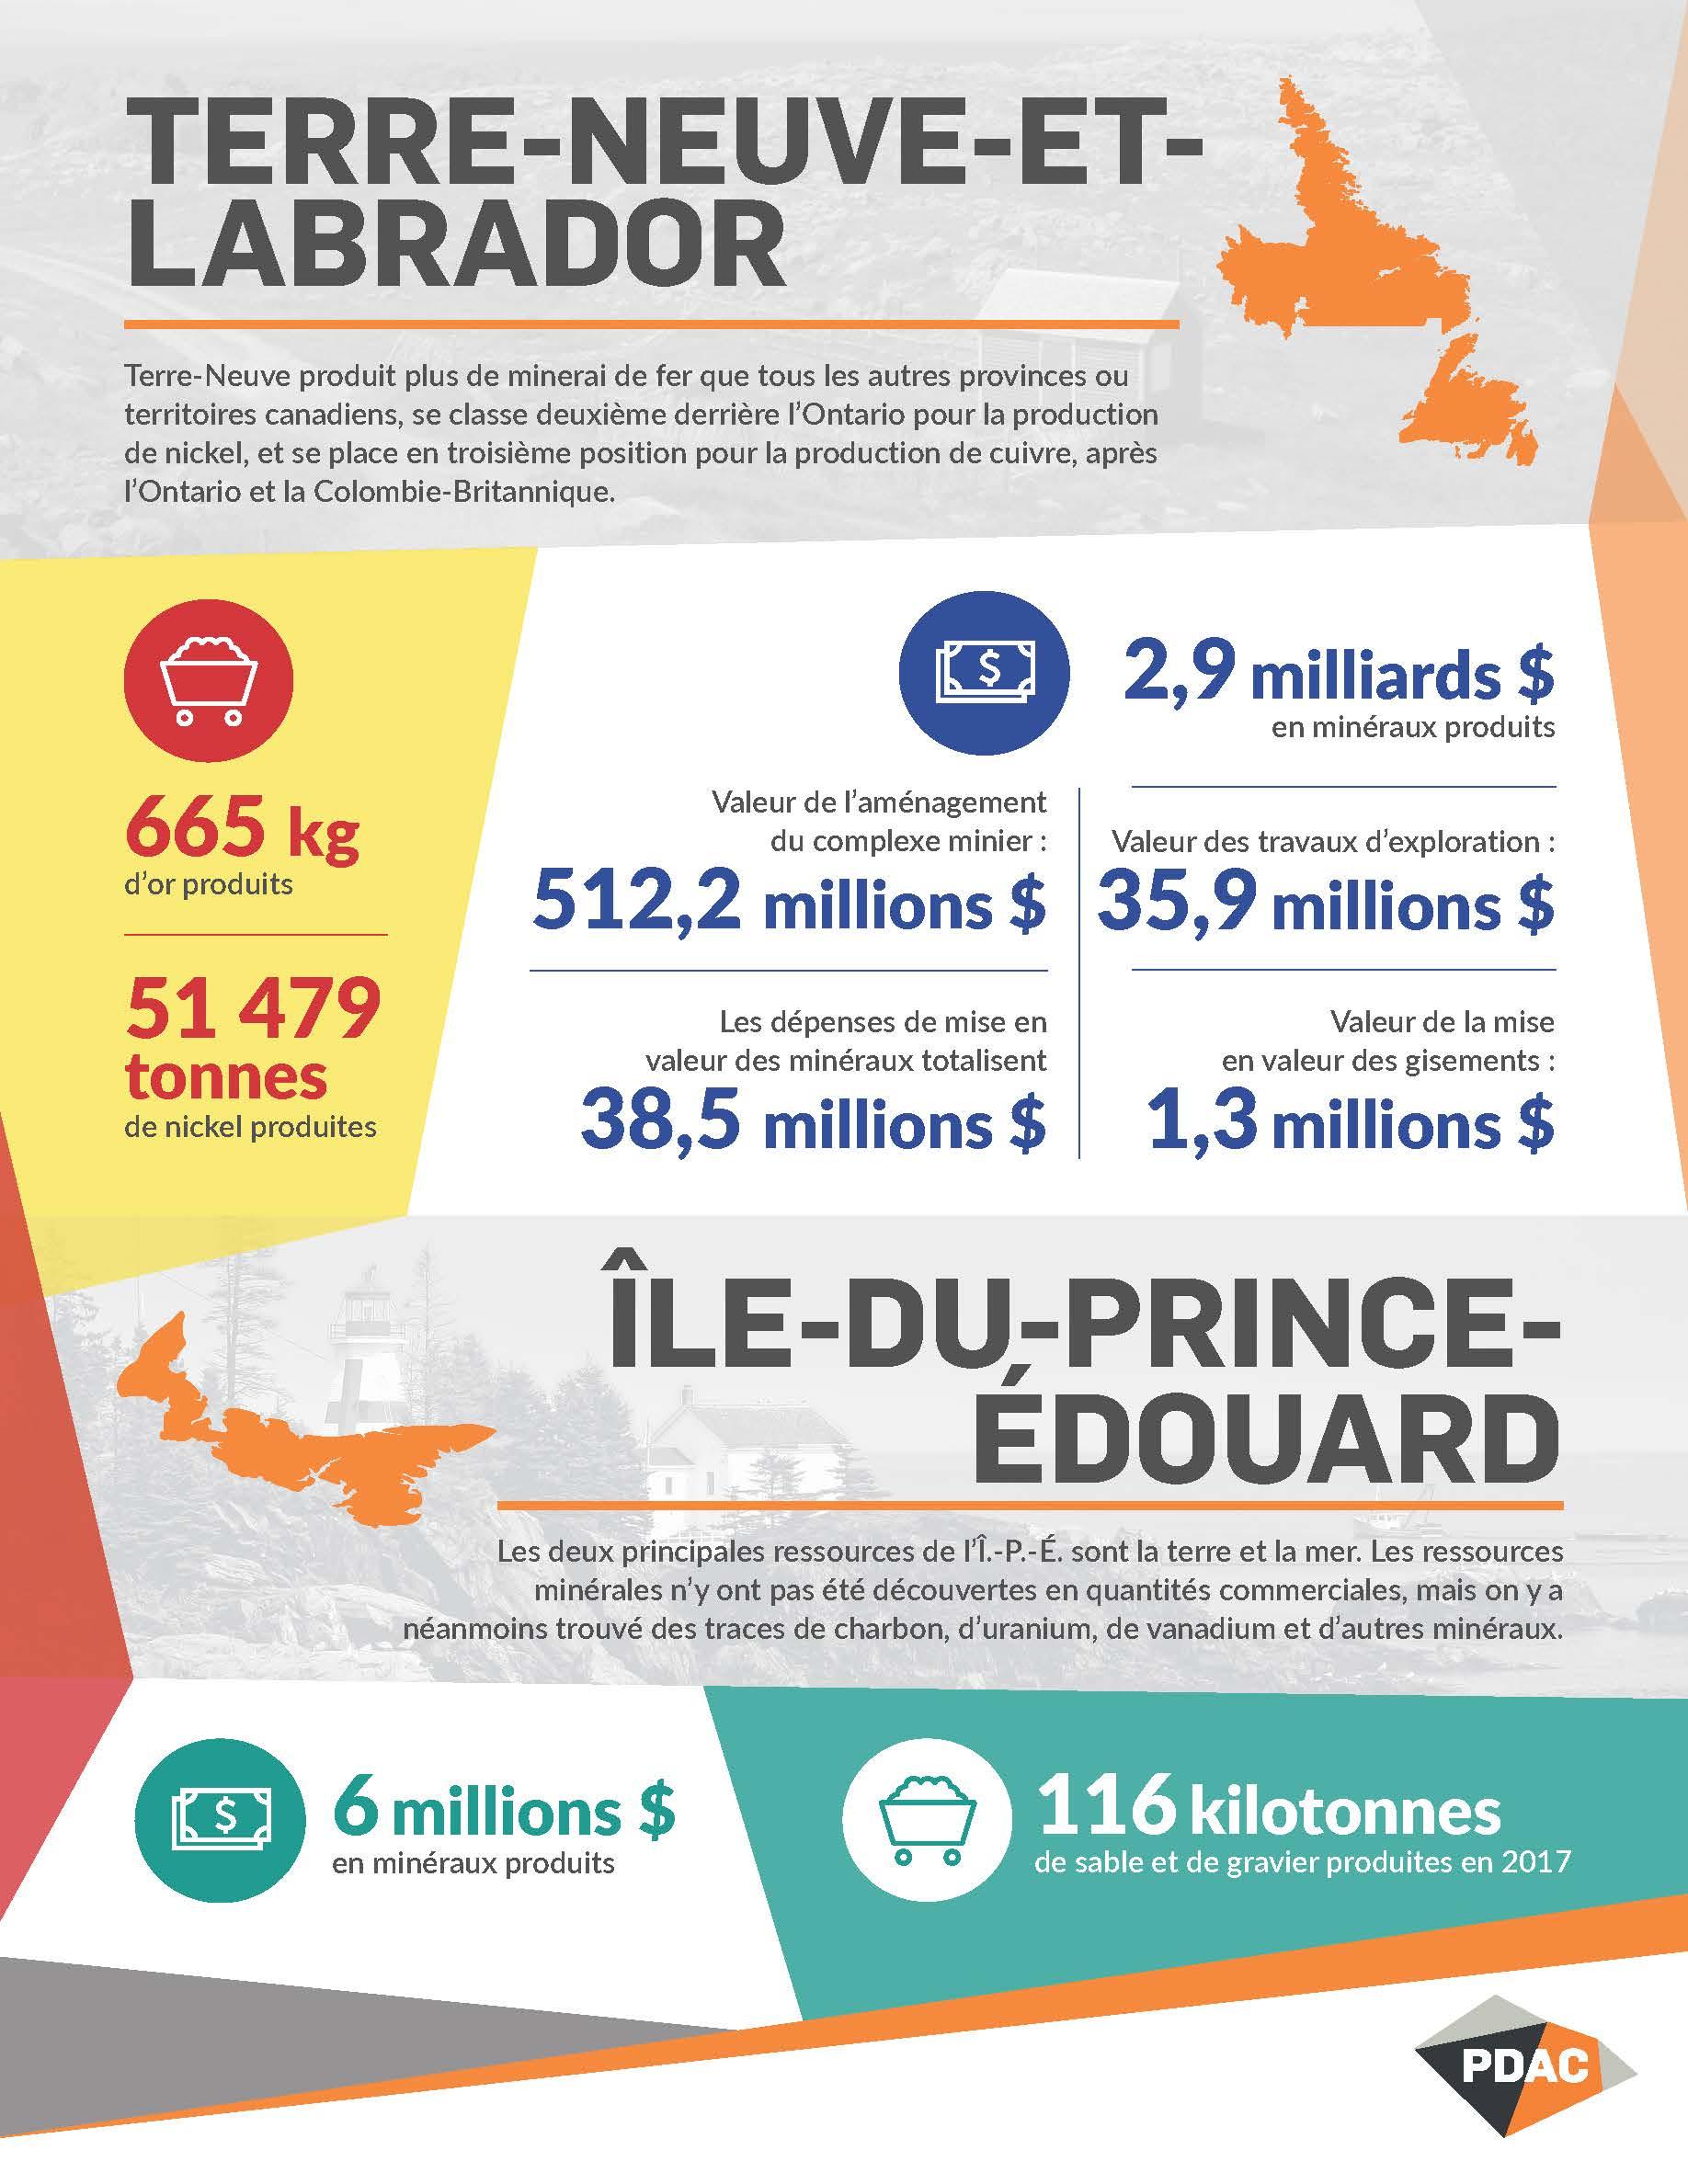 PDAC NewfoundlandPEI_FR